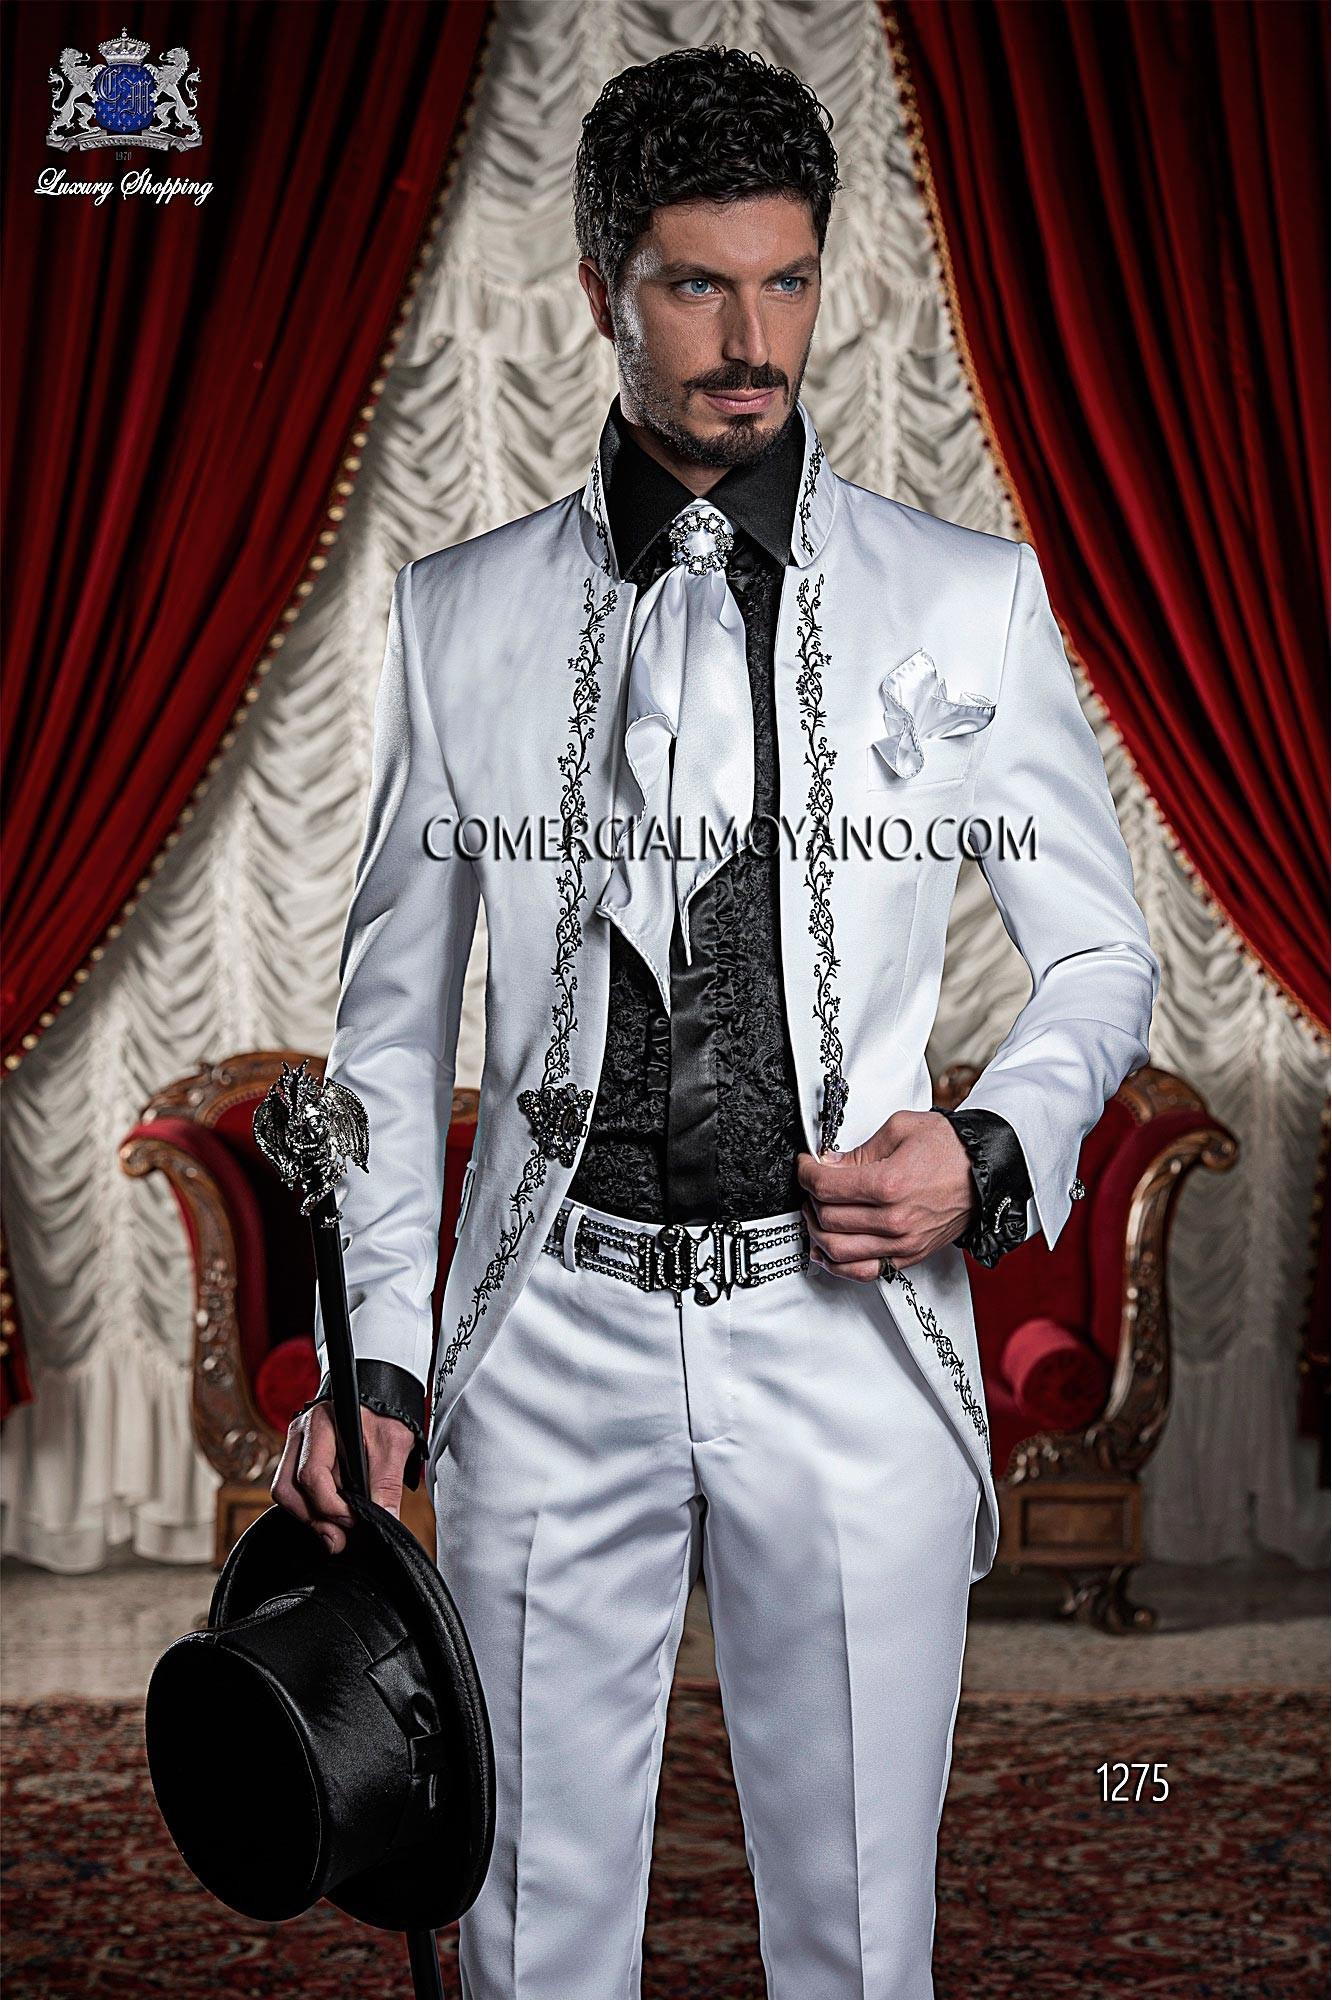 Italian bespoke white wedding suit style 1275 Ottavio Nuccio Gala.